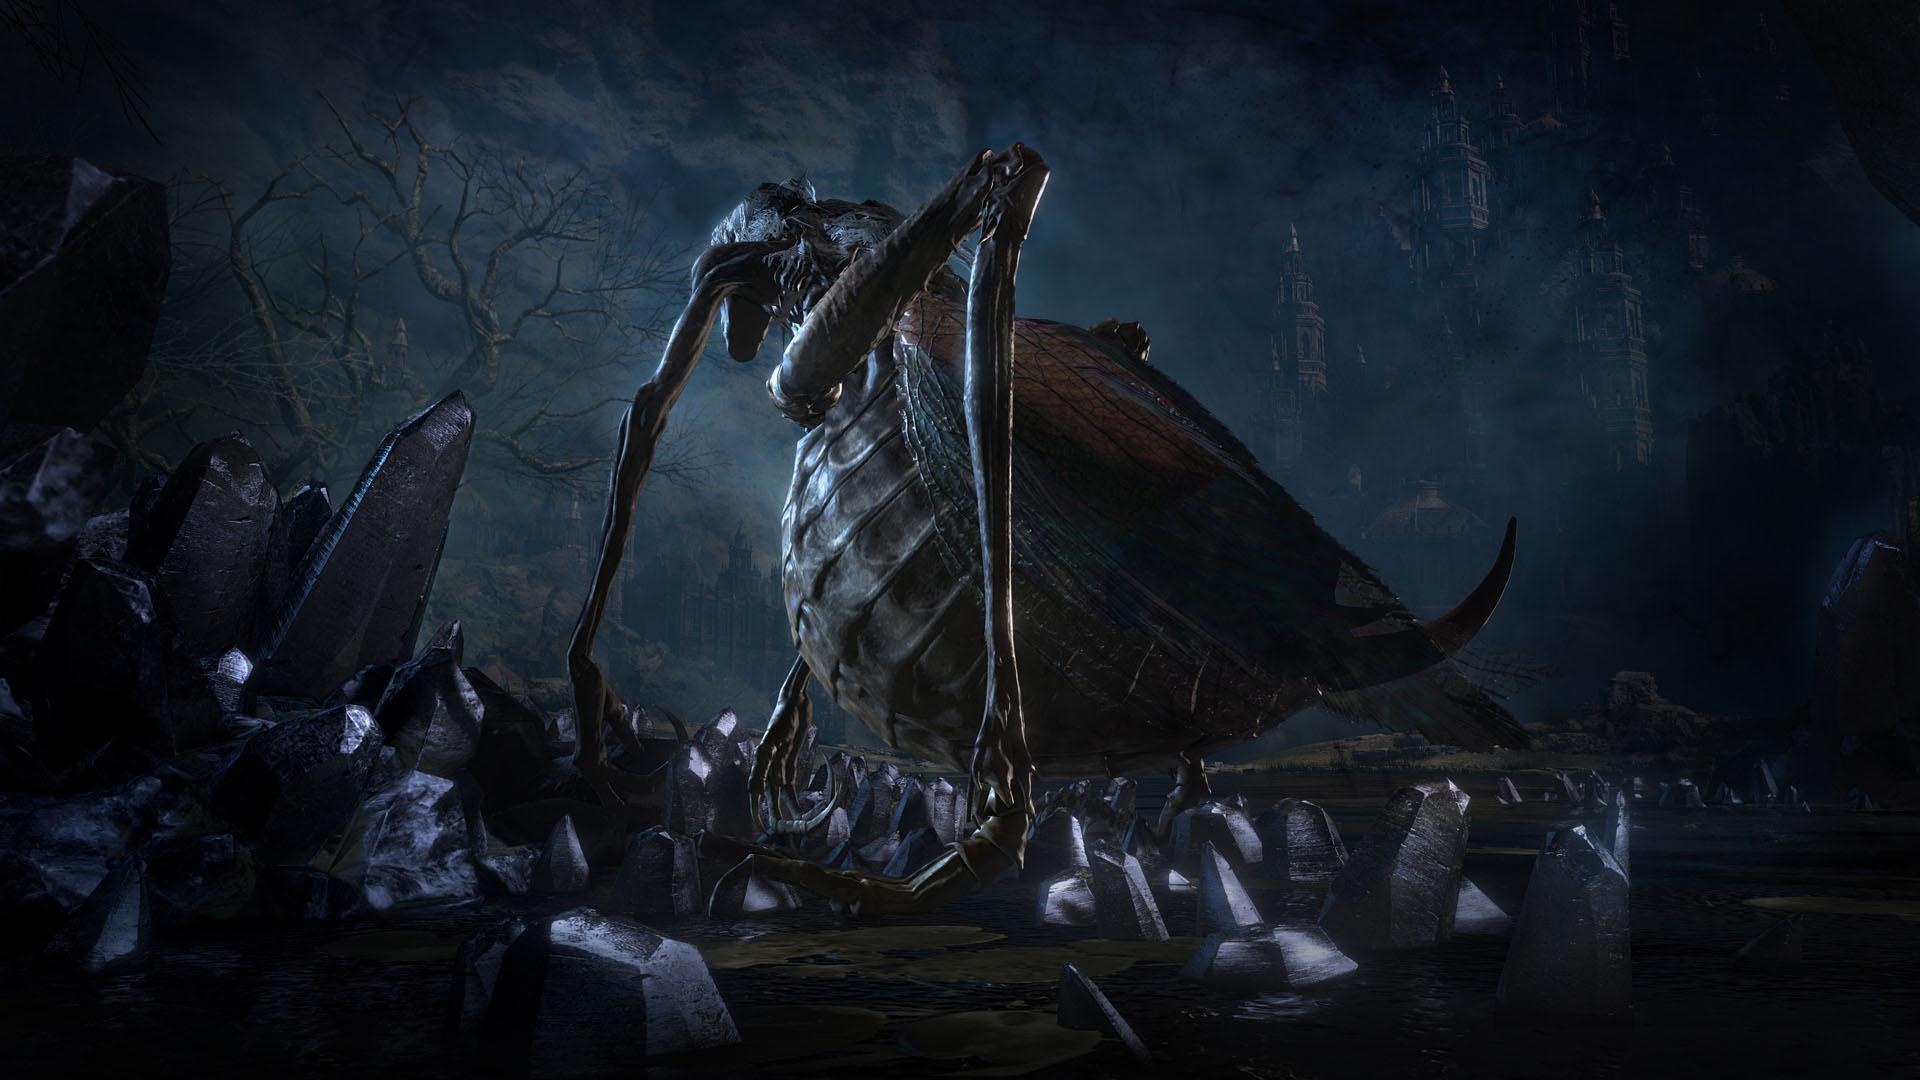 Dark Souls III: The Ringed City image 2